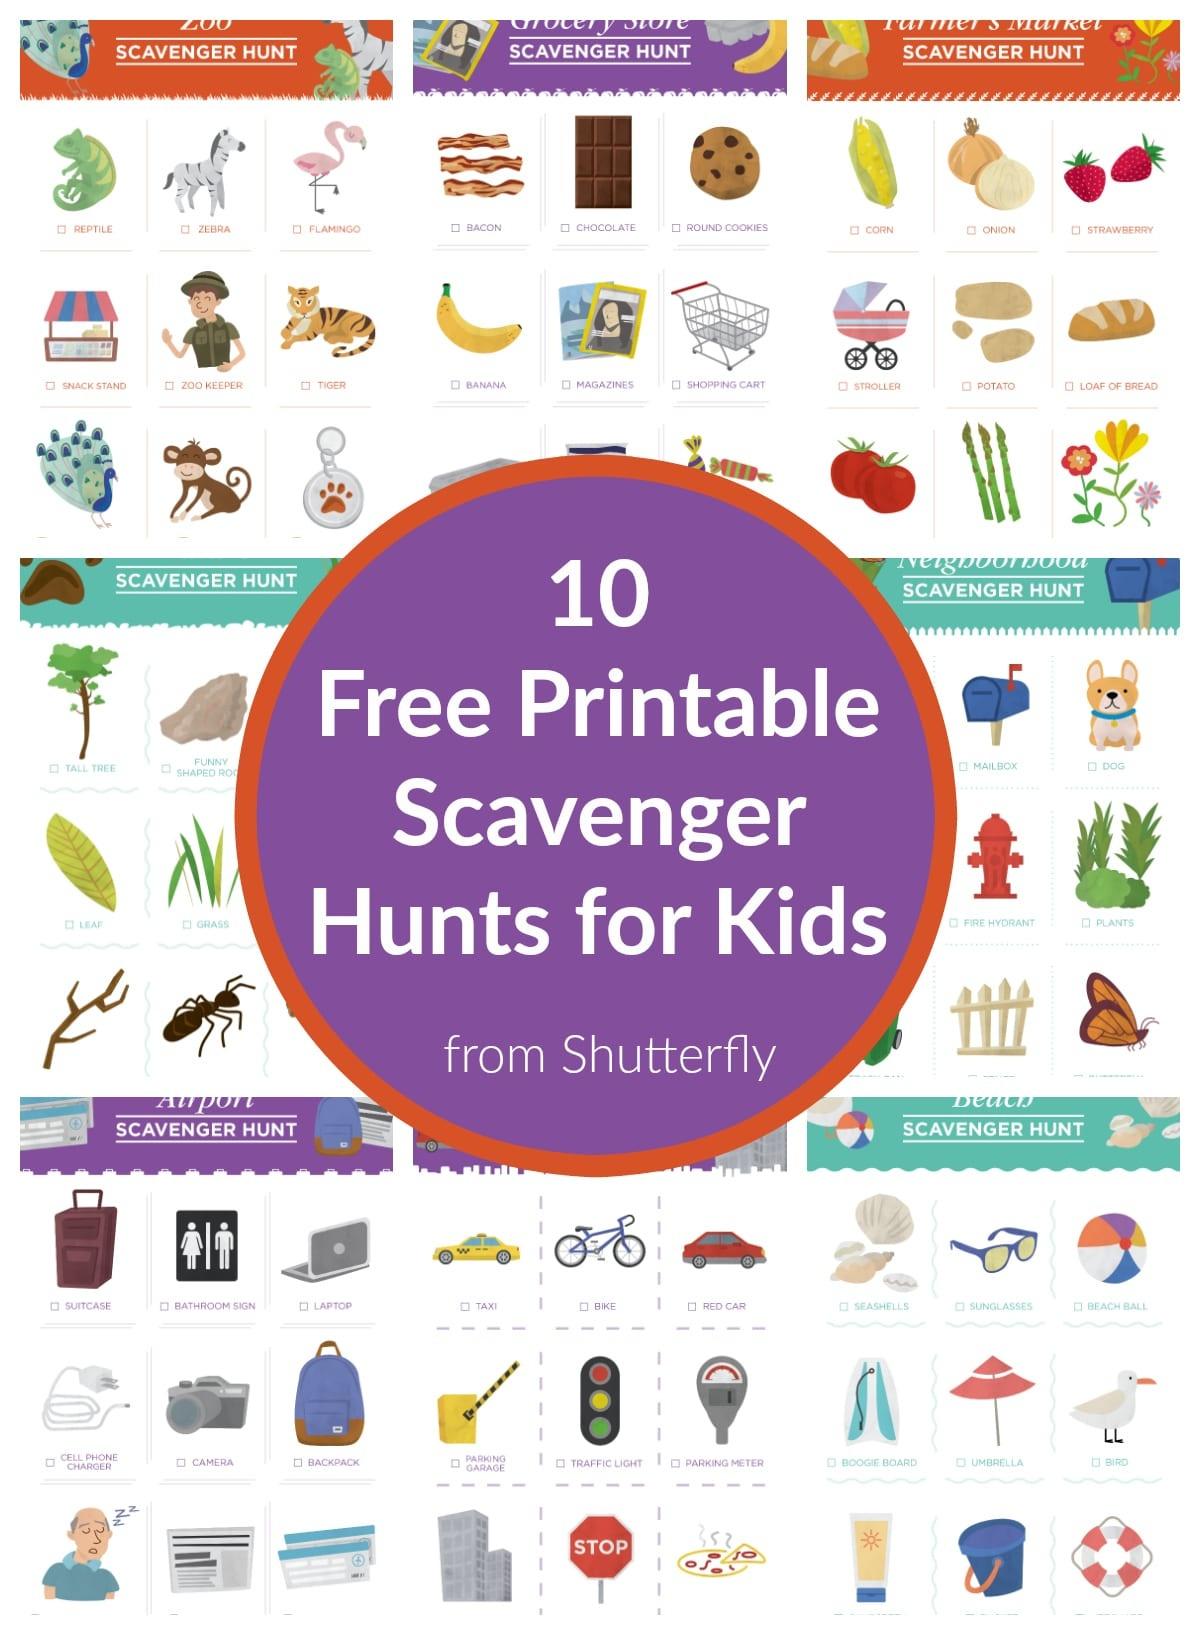 10 Free Scavenger Hunt Printables For Kids From Shutterfly - The - Free Printable Scavenger Hunt